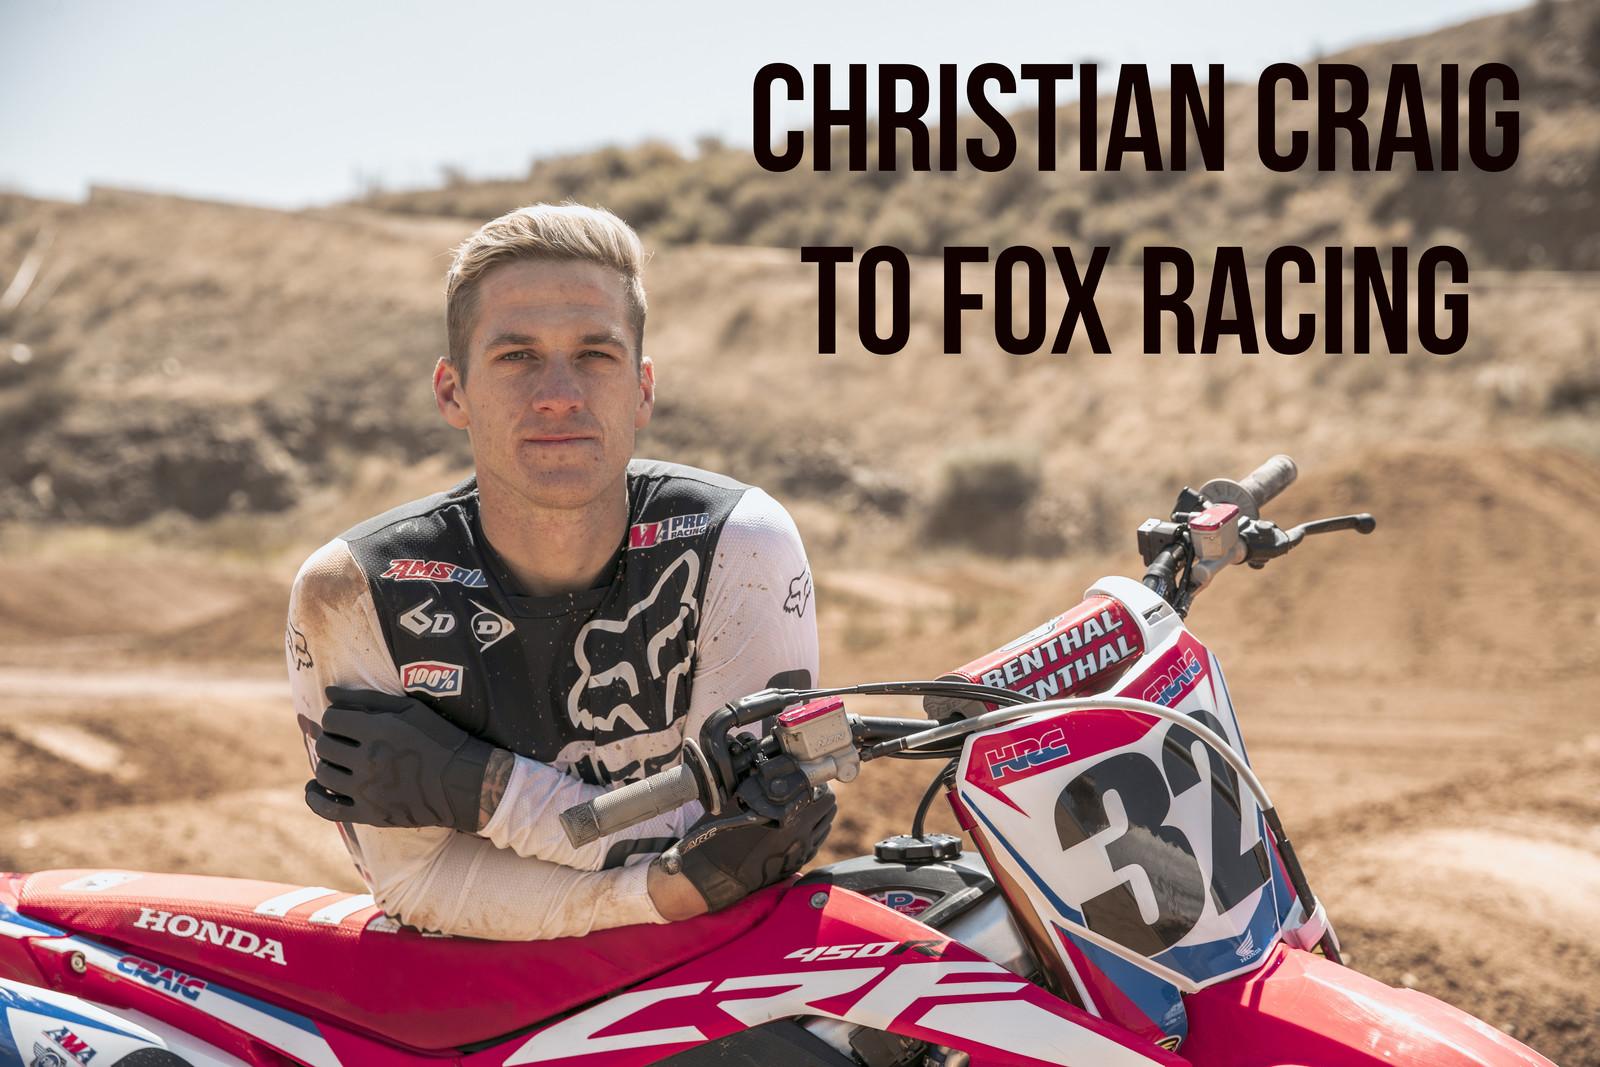 Christian Craig to Wear Fox Racewear for 2018 Pro Motocross Championship